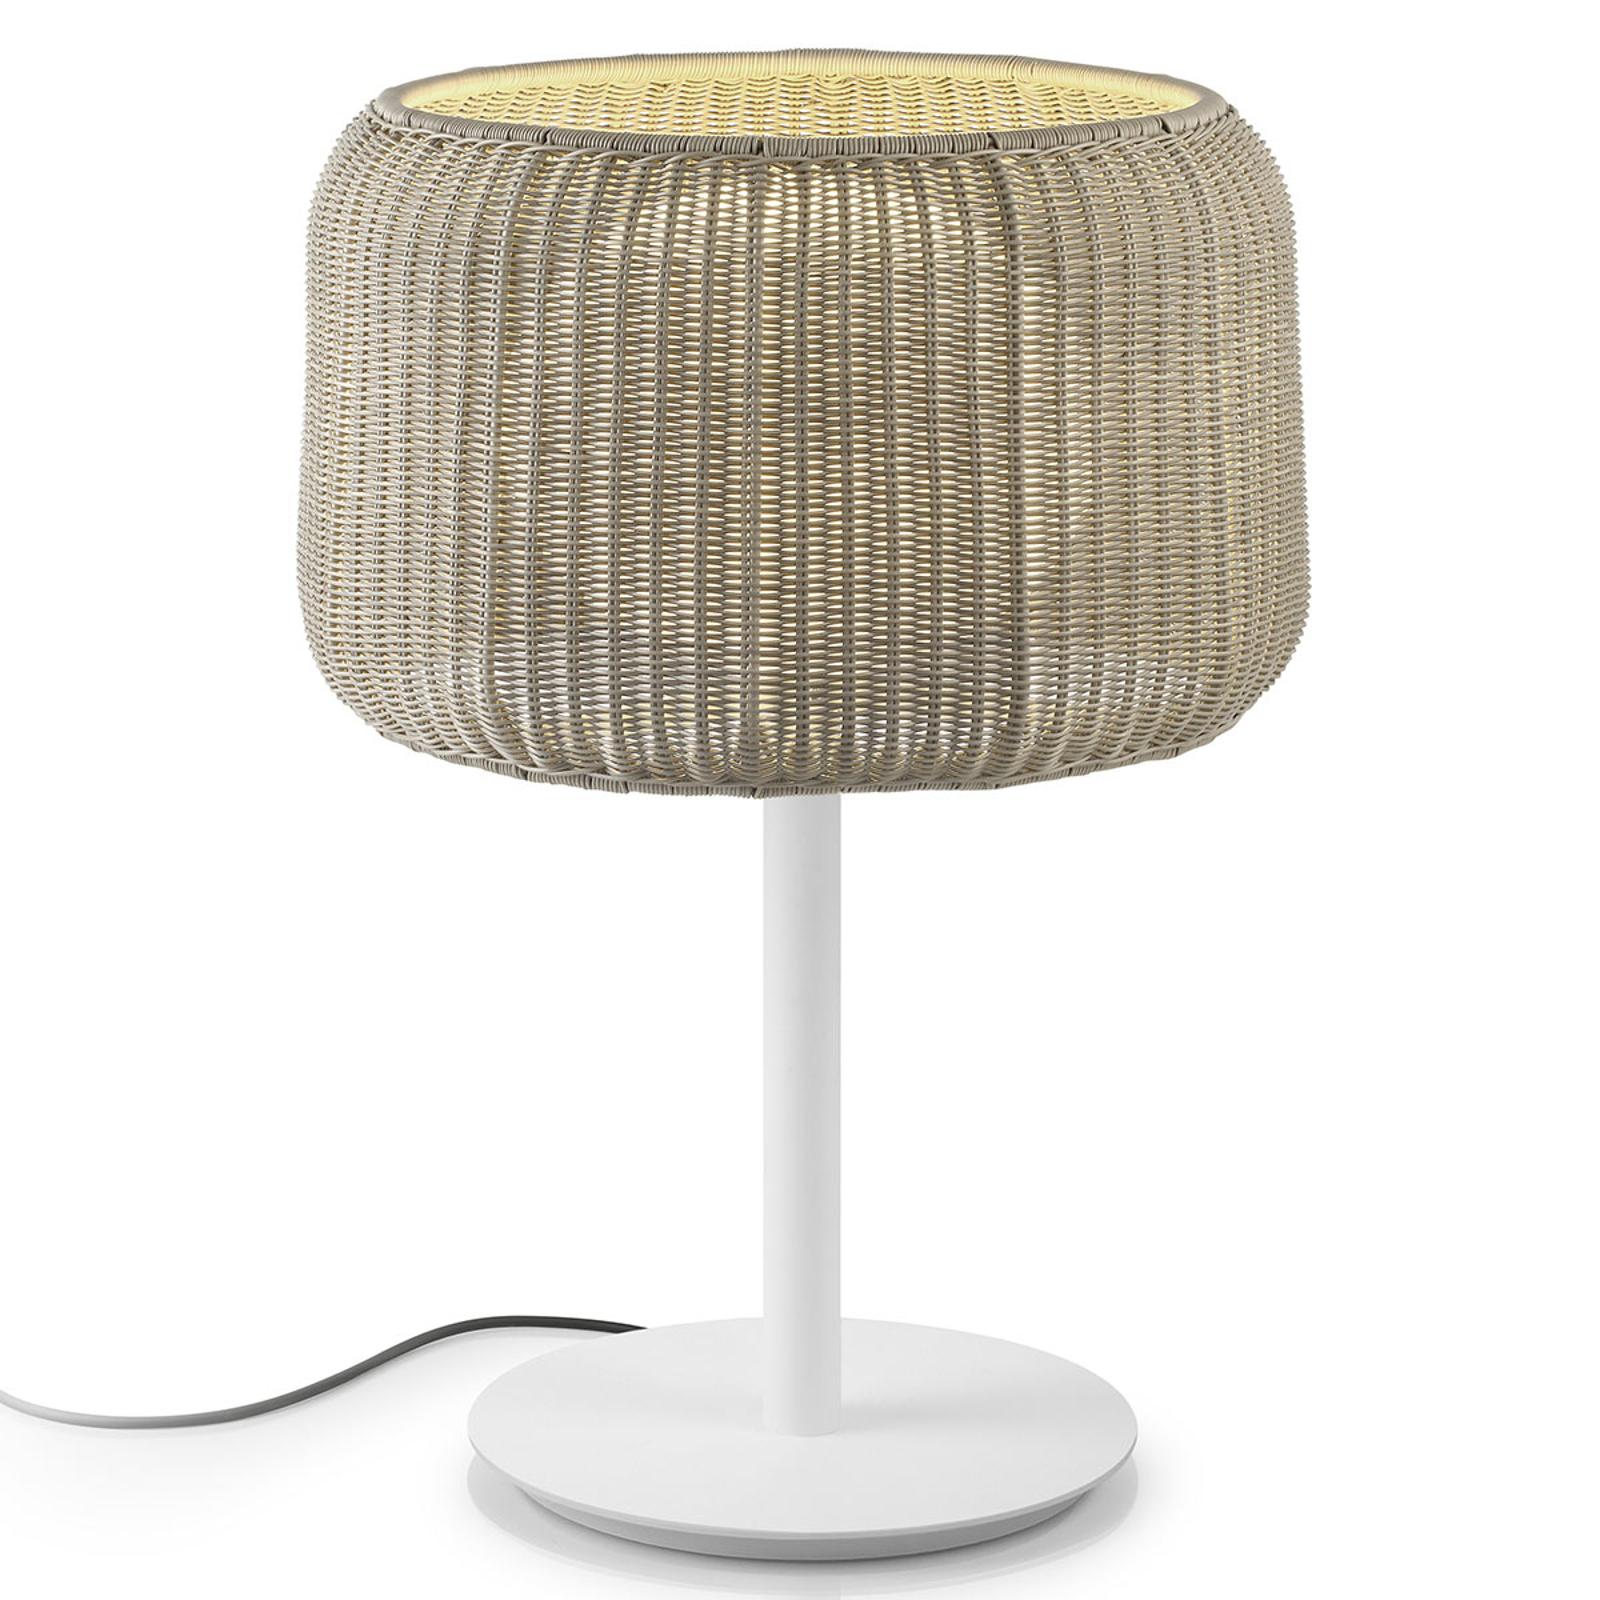 Bover Fora M - utomhusbordslampa, vit-beige